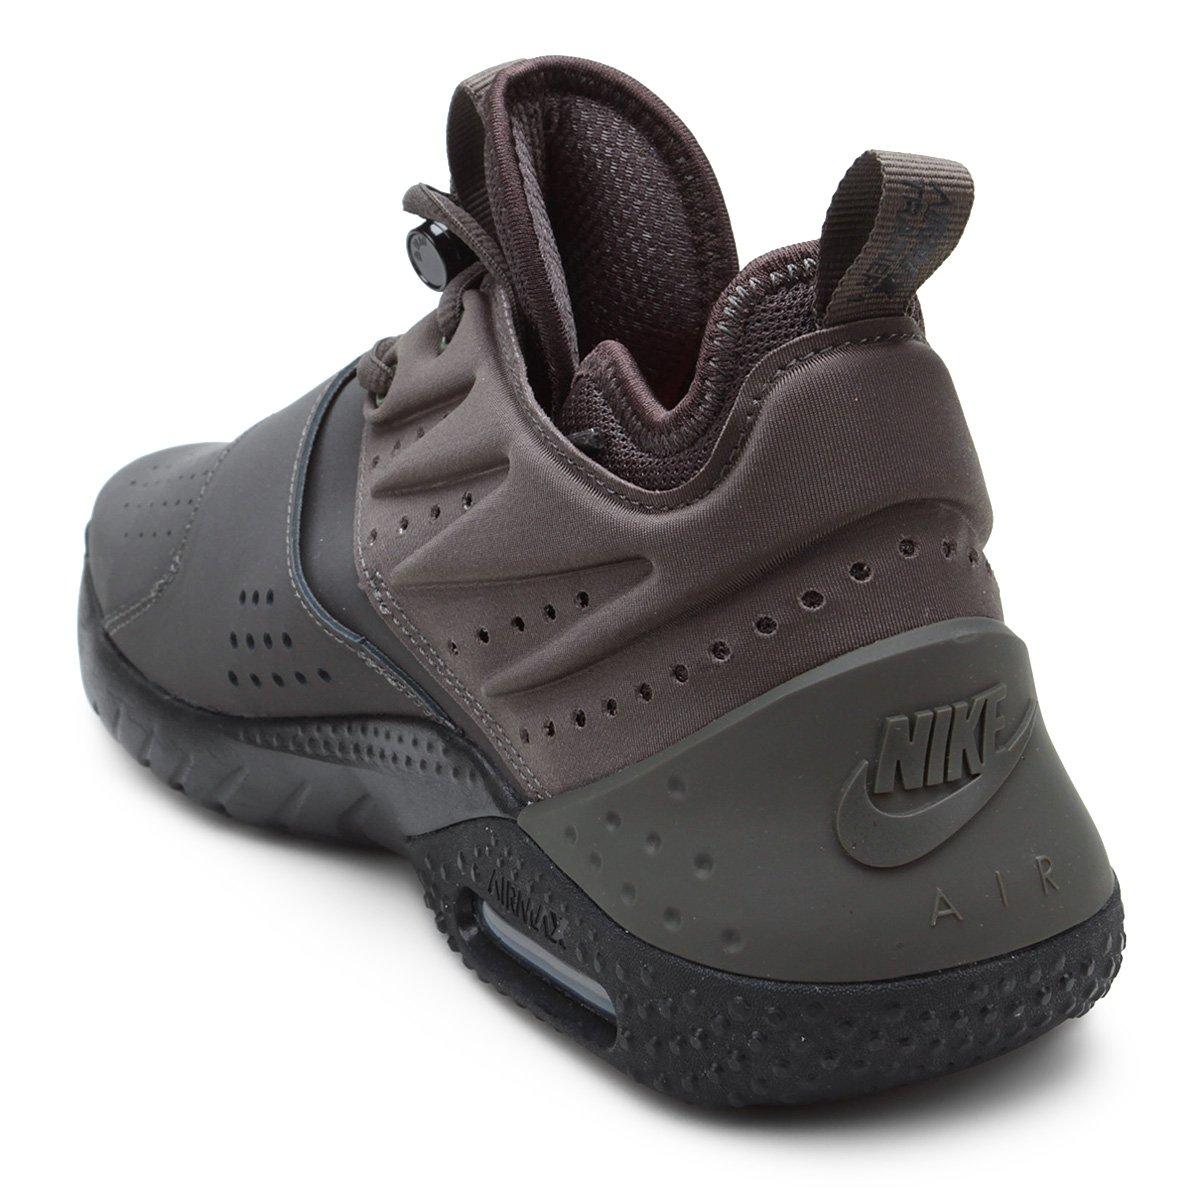 3c810dd5fa Tênis Nike Air Max Trainer 1 Leather Masculino - Chumbo e Verde ...